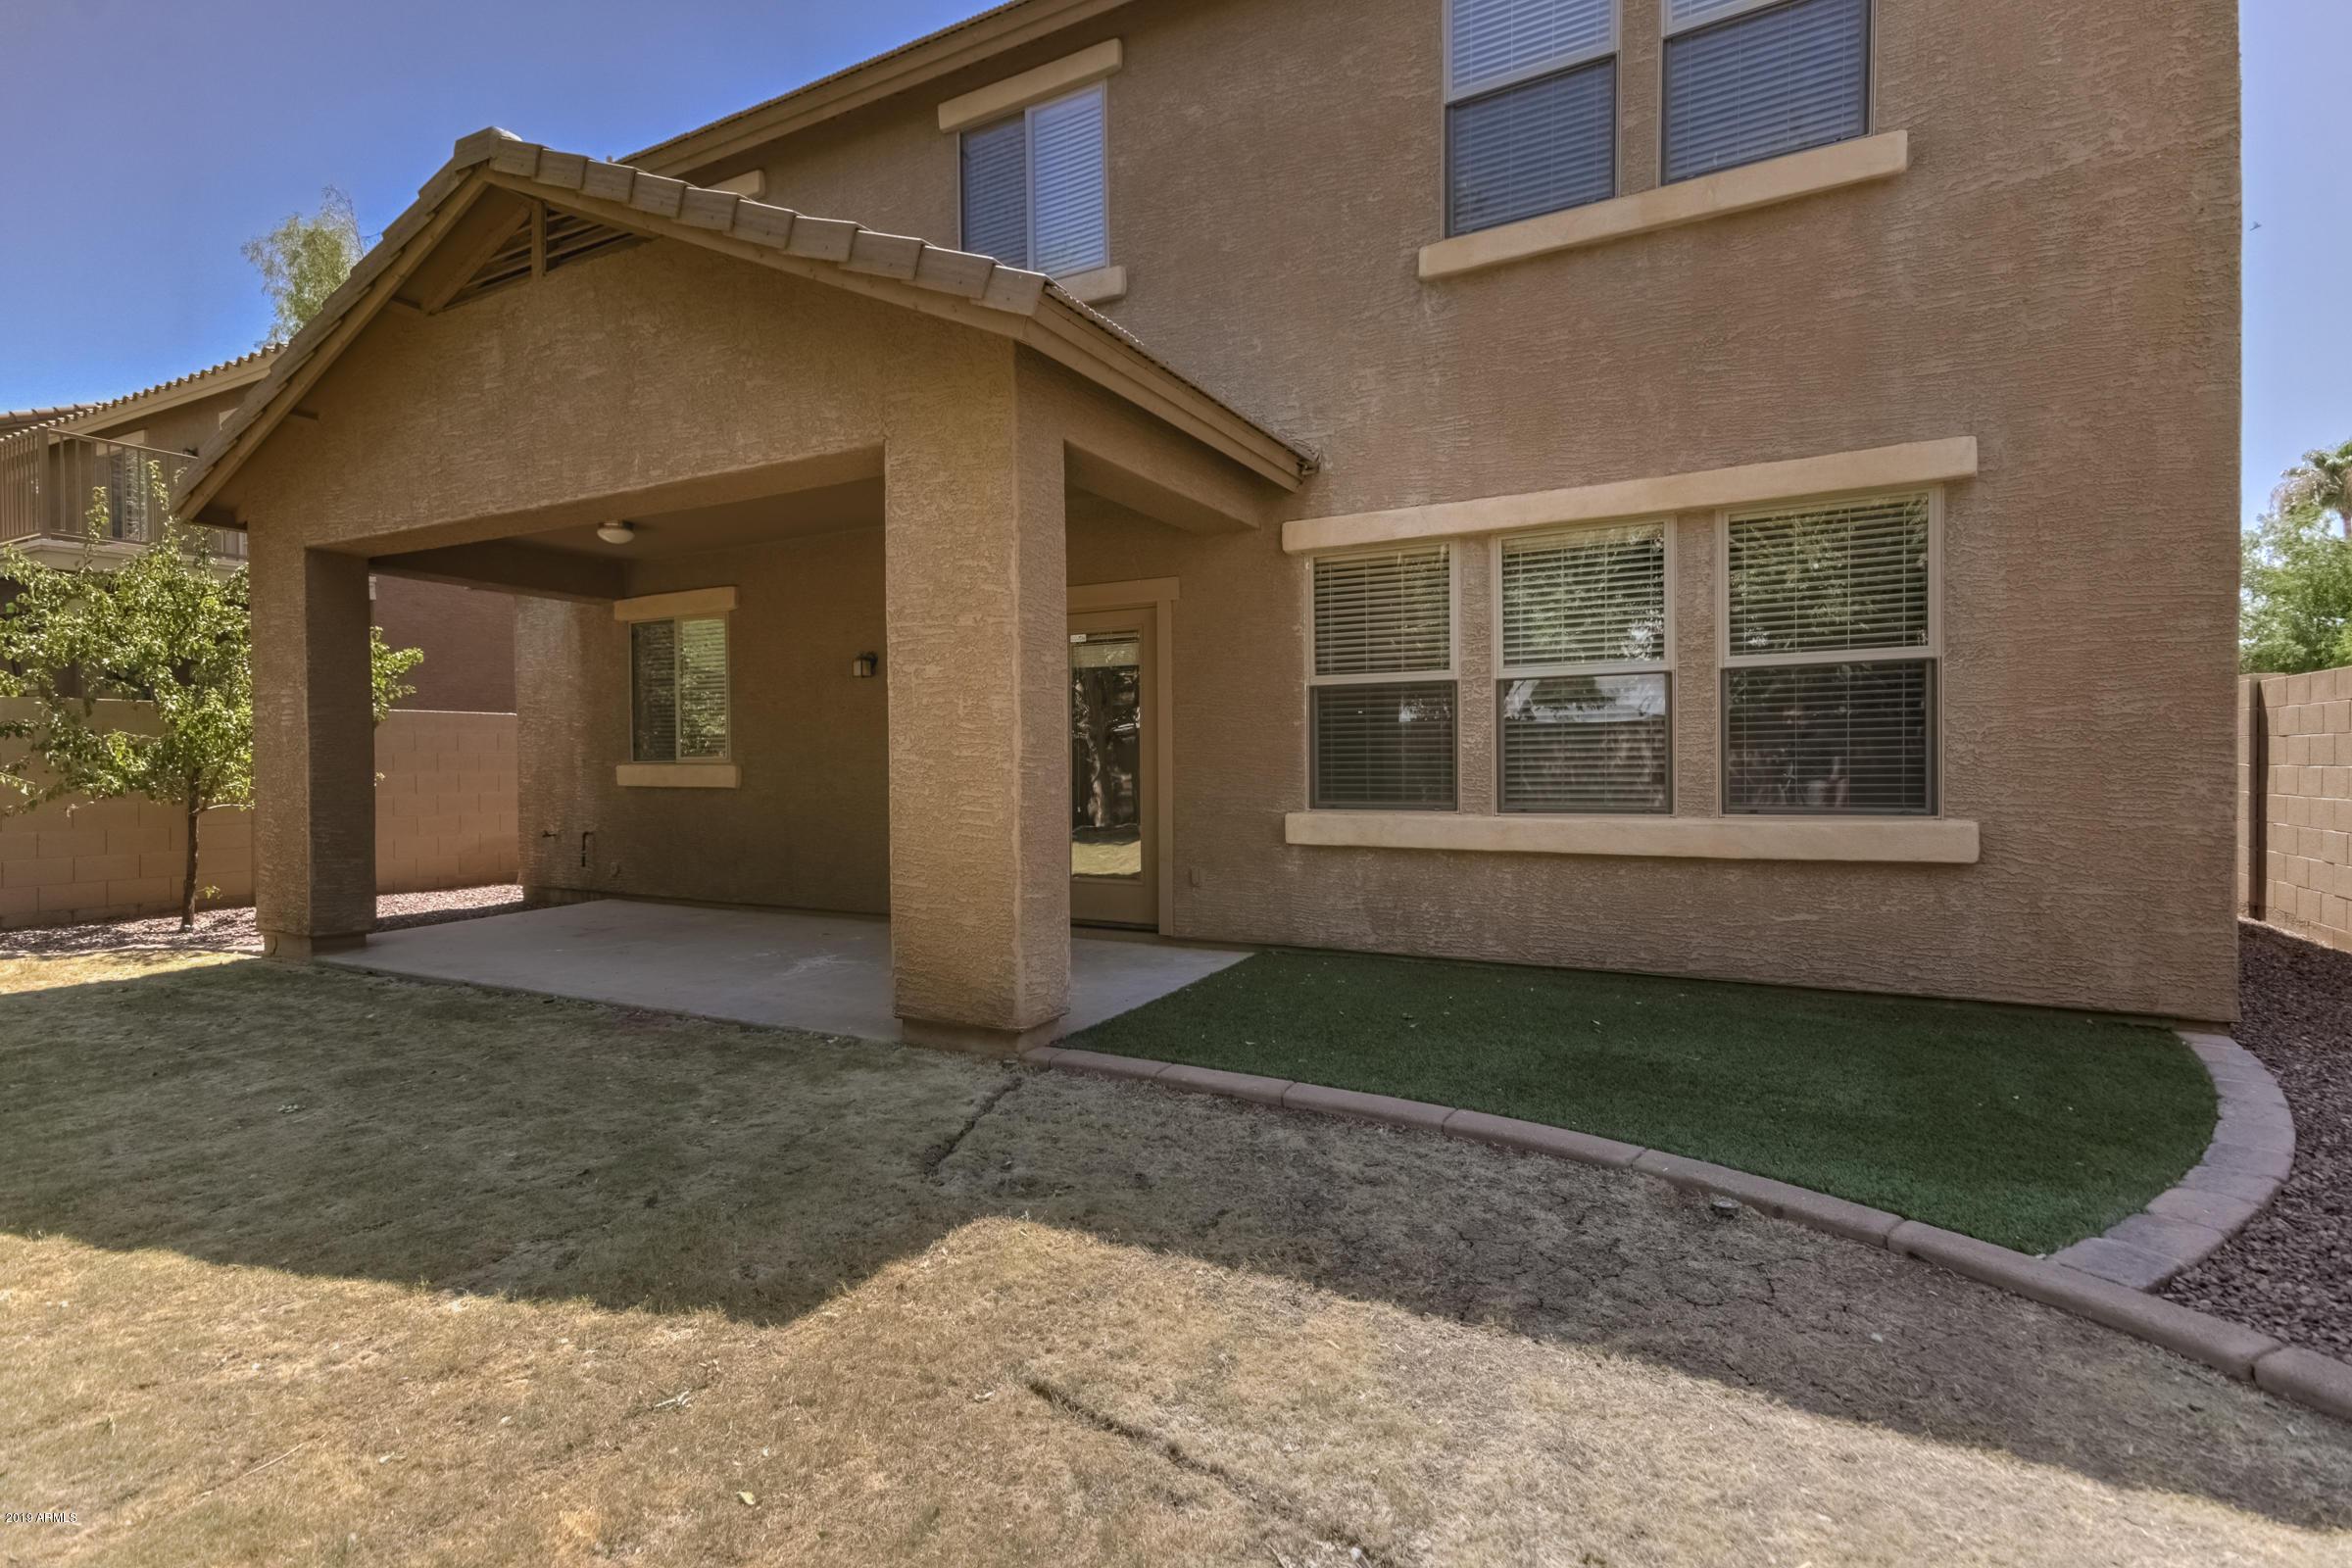 MLS 5953847 1787 S STARLING Drive, Gilbert, AZ 85295 Gilbert AZ Gateway Village